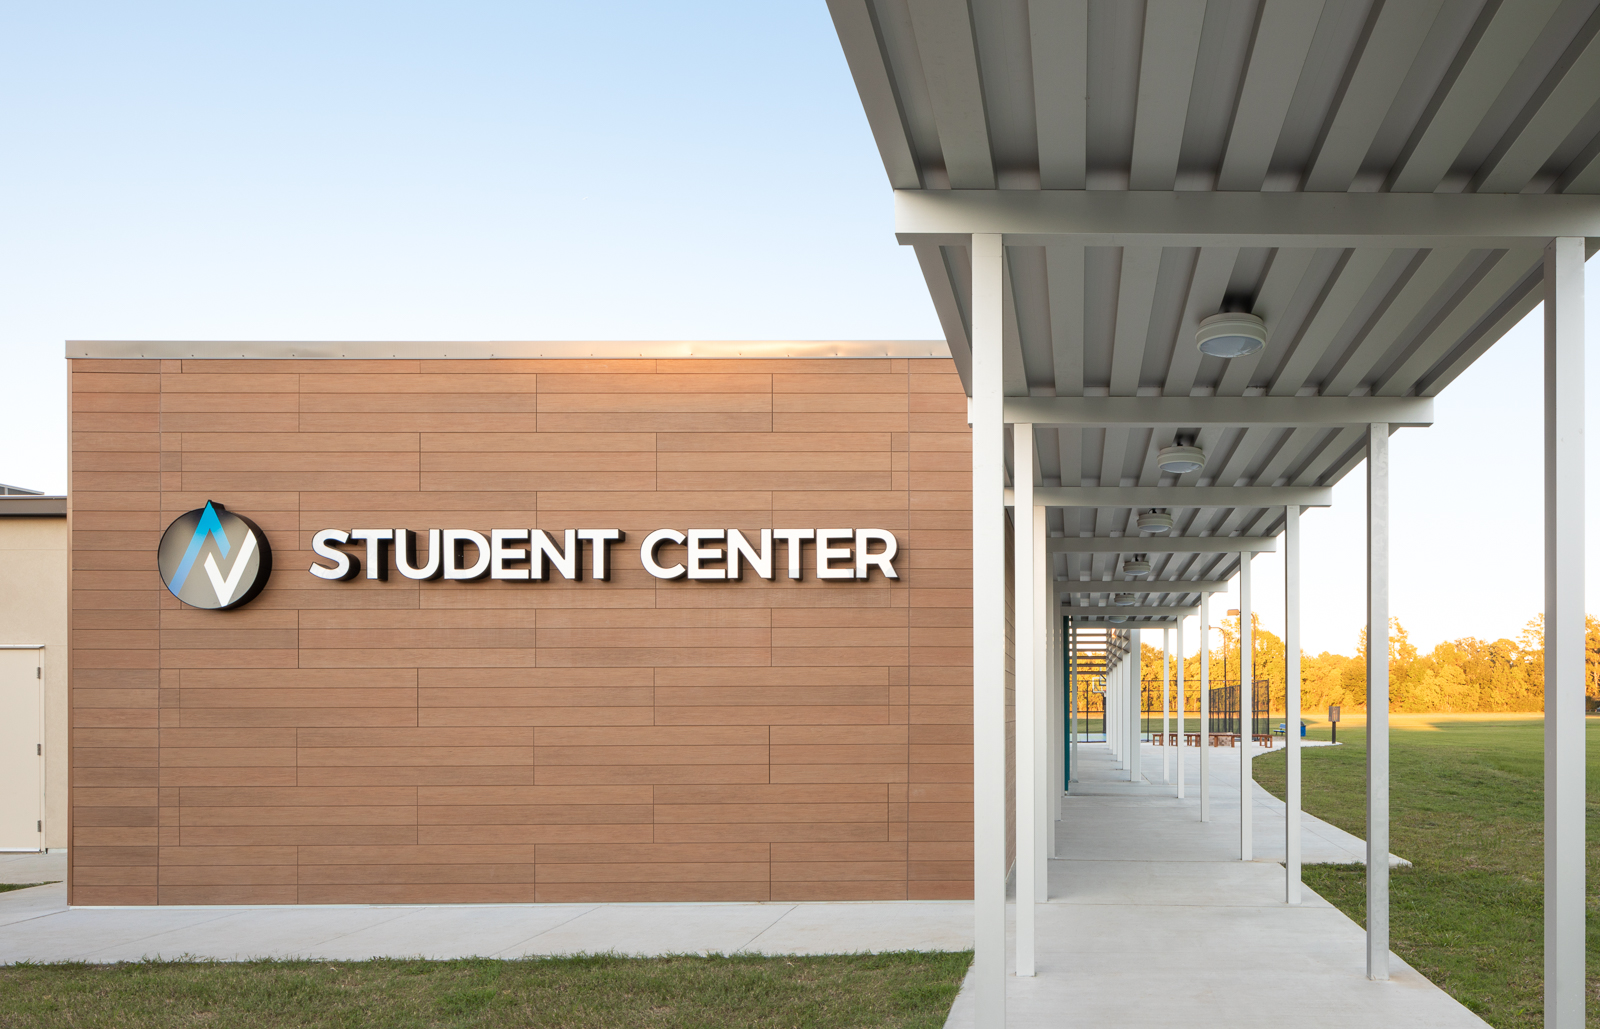 North_Central_Student_Center-1_V1